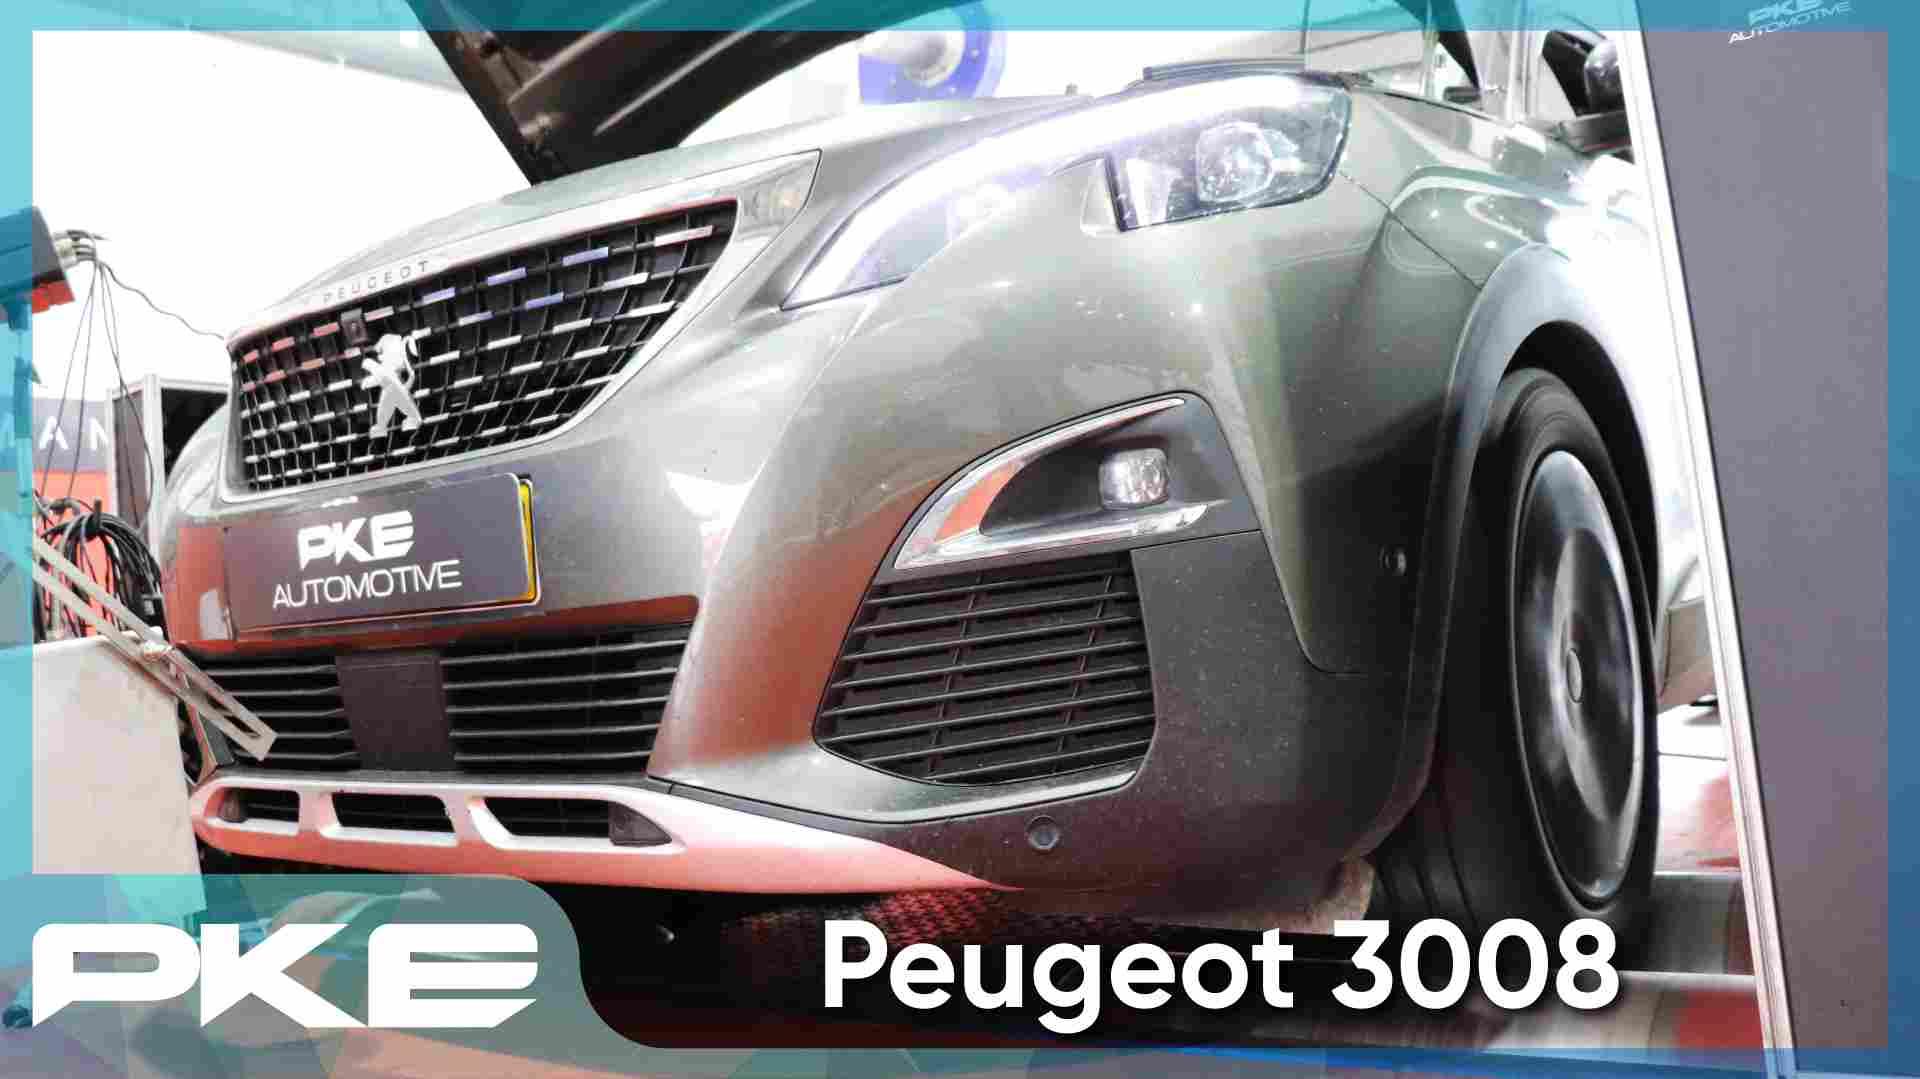 PKE SuperSPORT - Peugeot 3008 1.5 BlueHDi